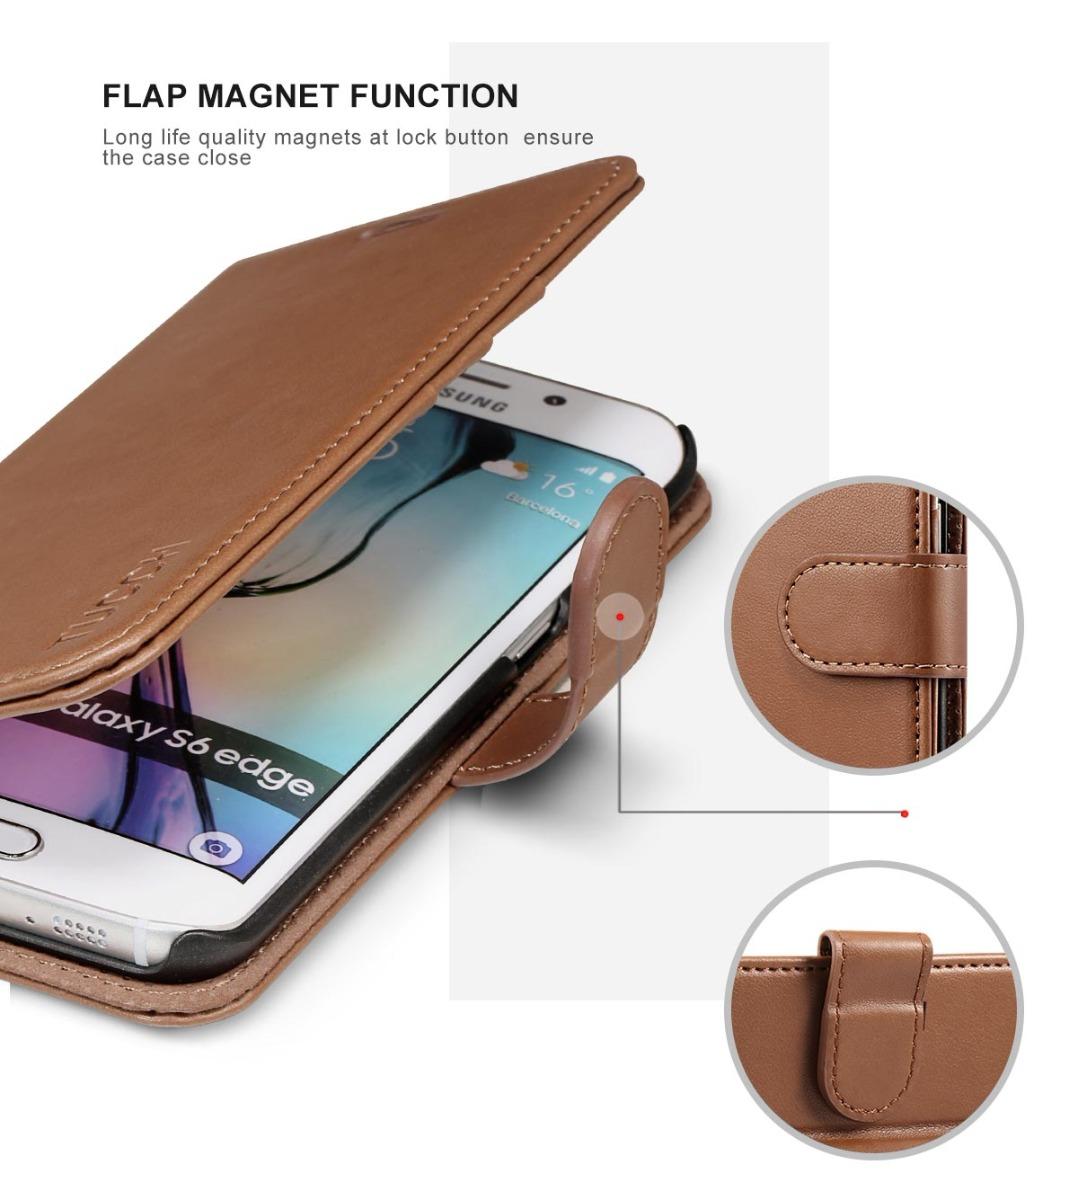 TUCCH Galaxy S6 Edge Case